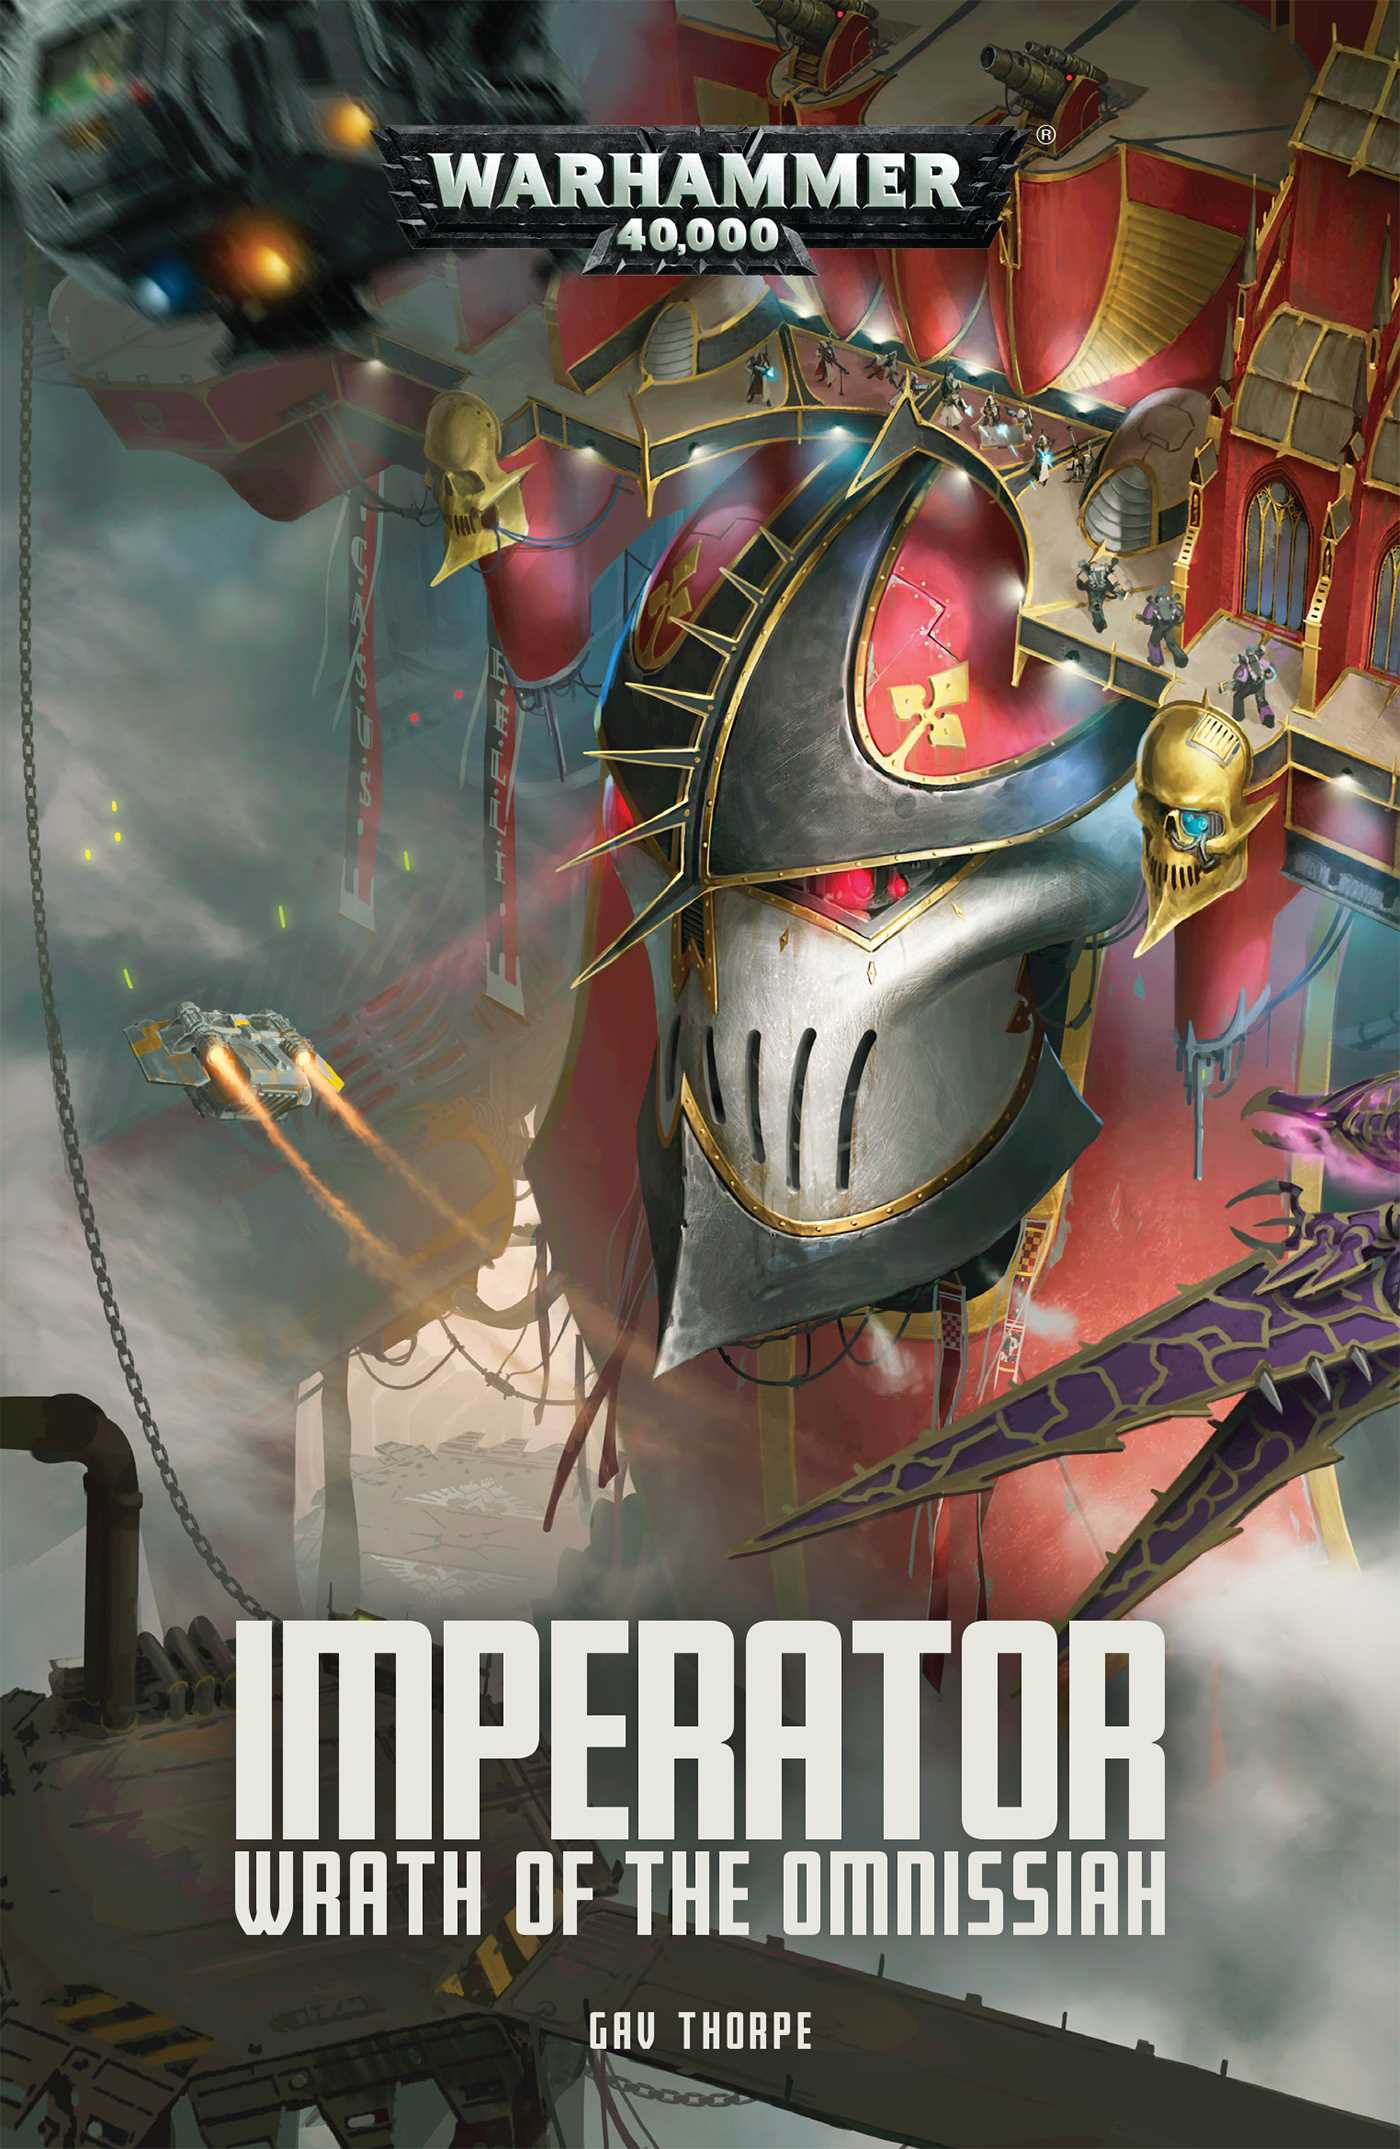 Imperator wrath of the omnissiah 9781784967789 hr